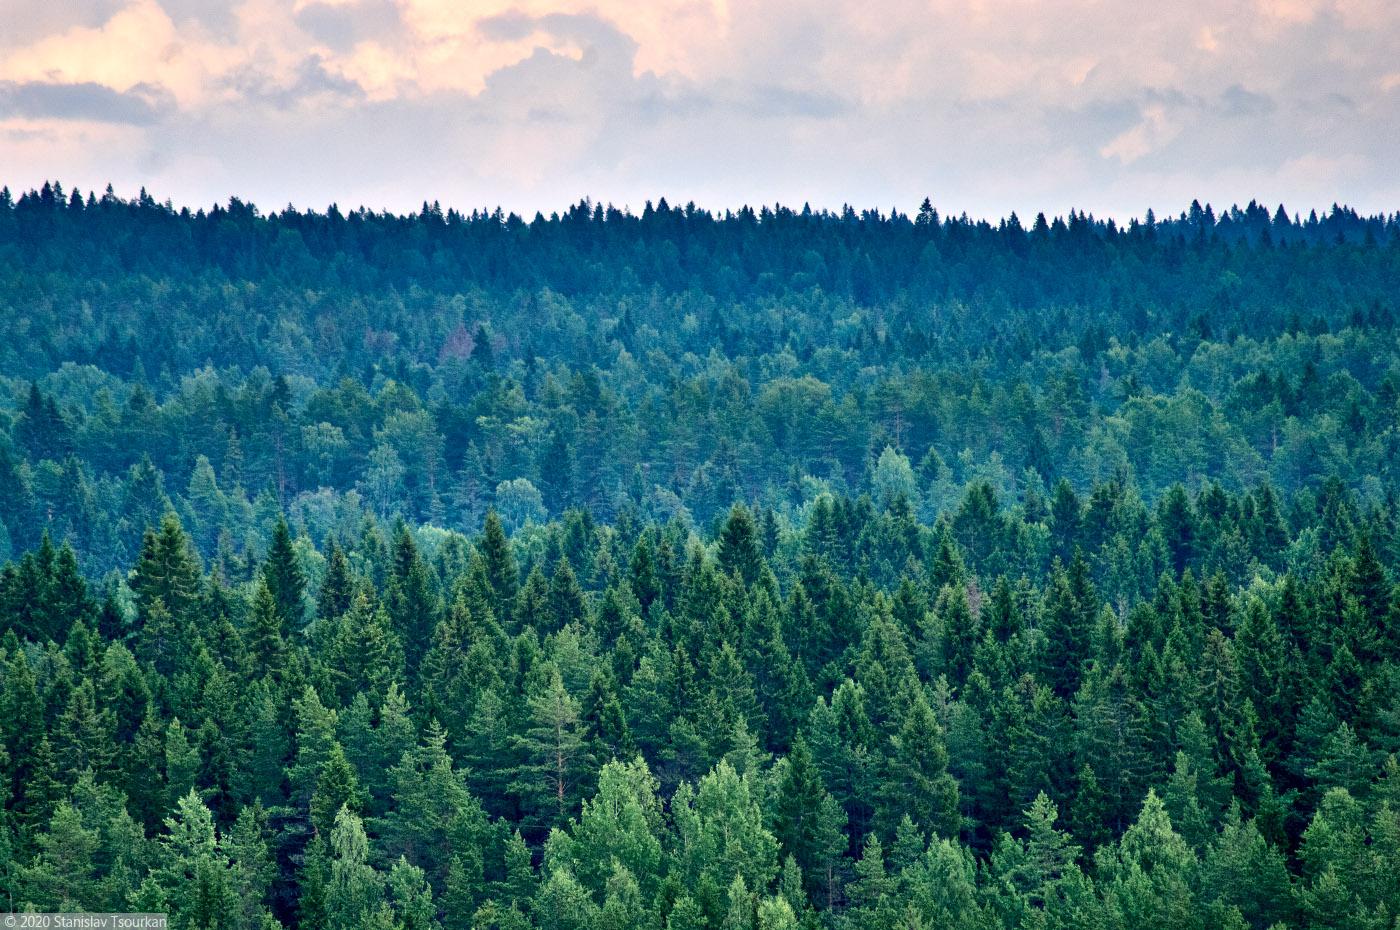 Карелия, республика Карелия, гора, Хийденвуори, пейзажи, природа, Ладожское озеро